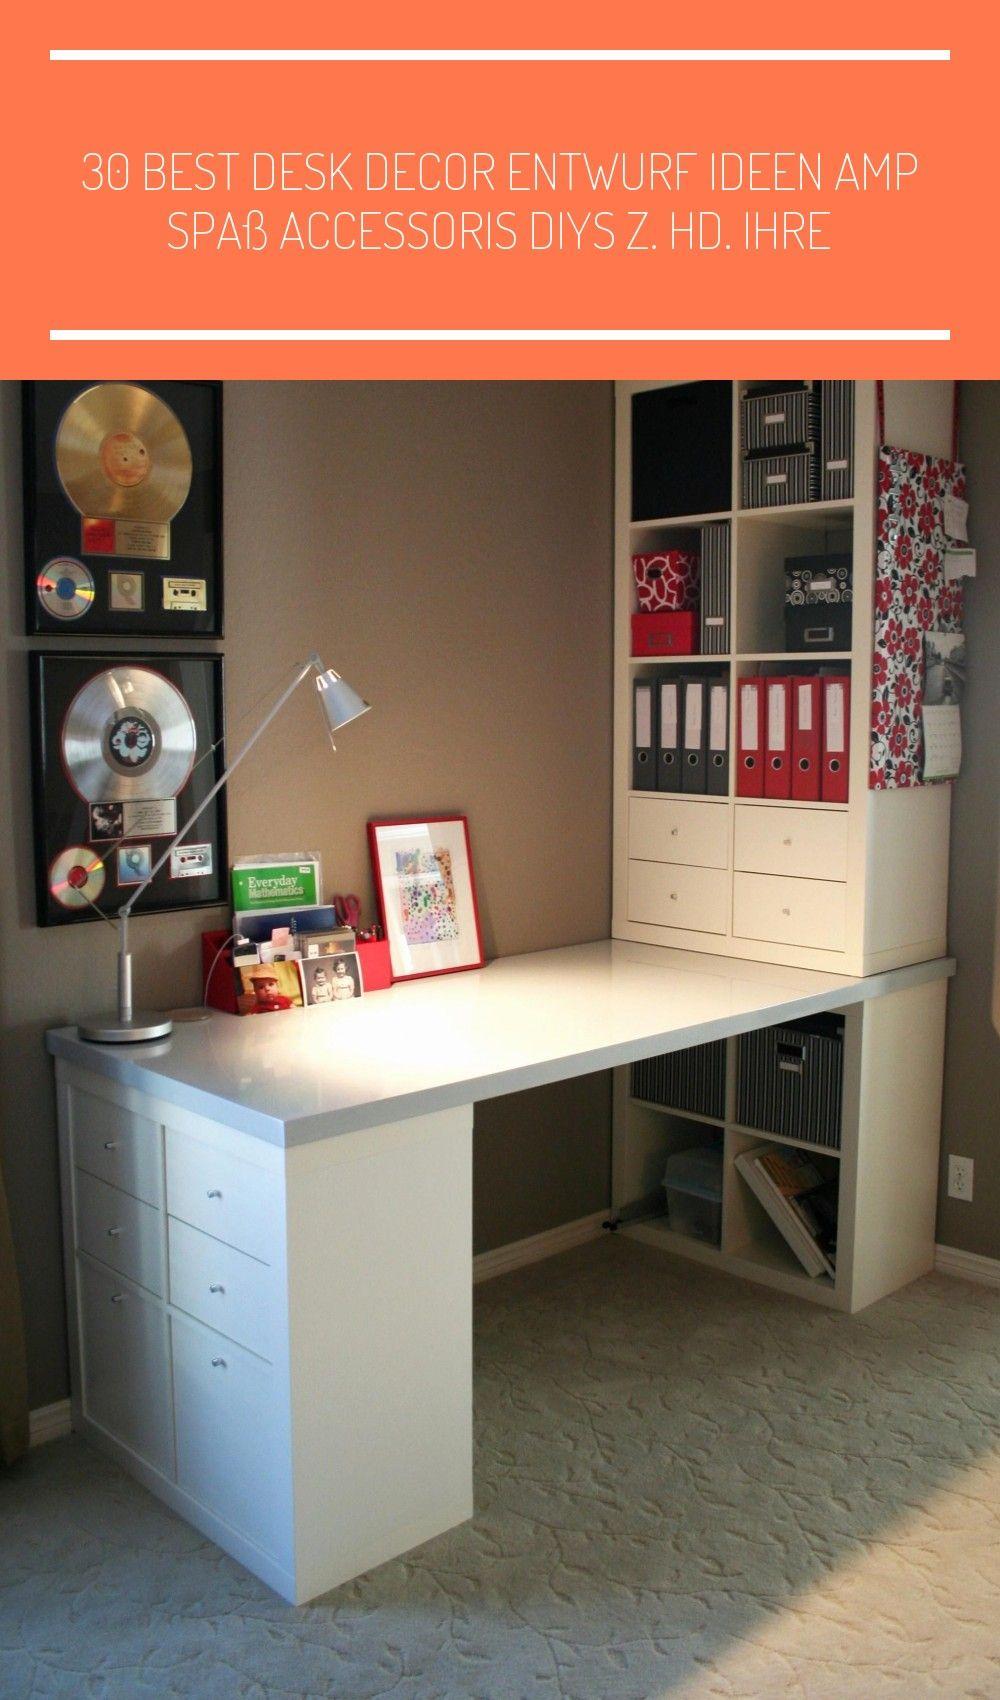 30 Best Desk Decor Entwurf Ide In 2021 Home Office Design Craft Room Office Ikea Diy